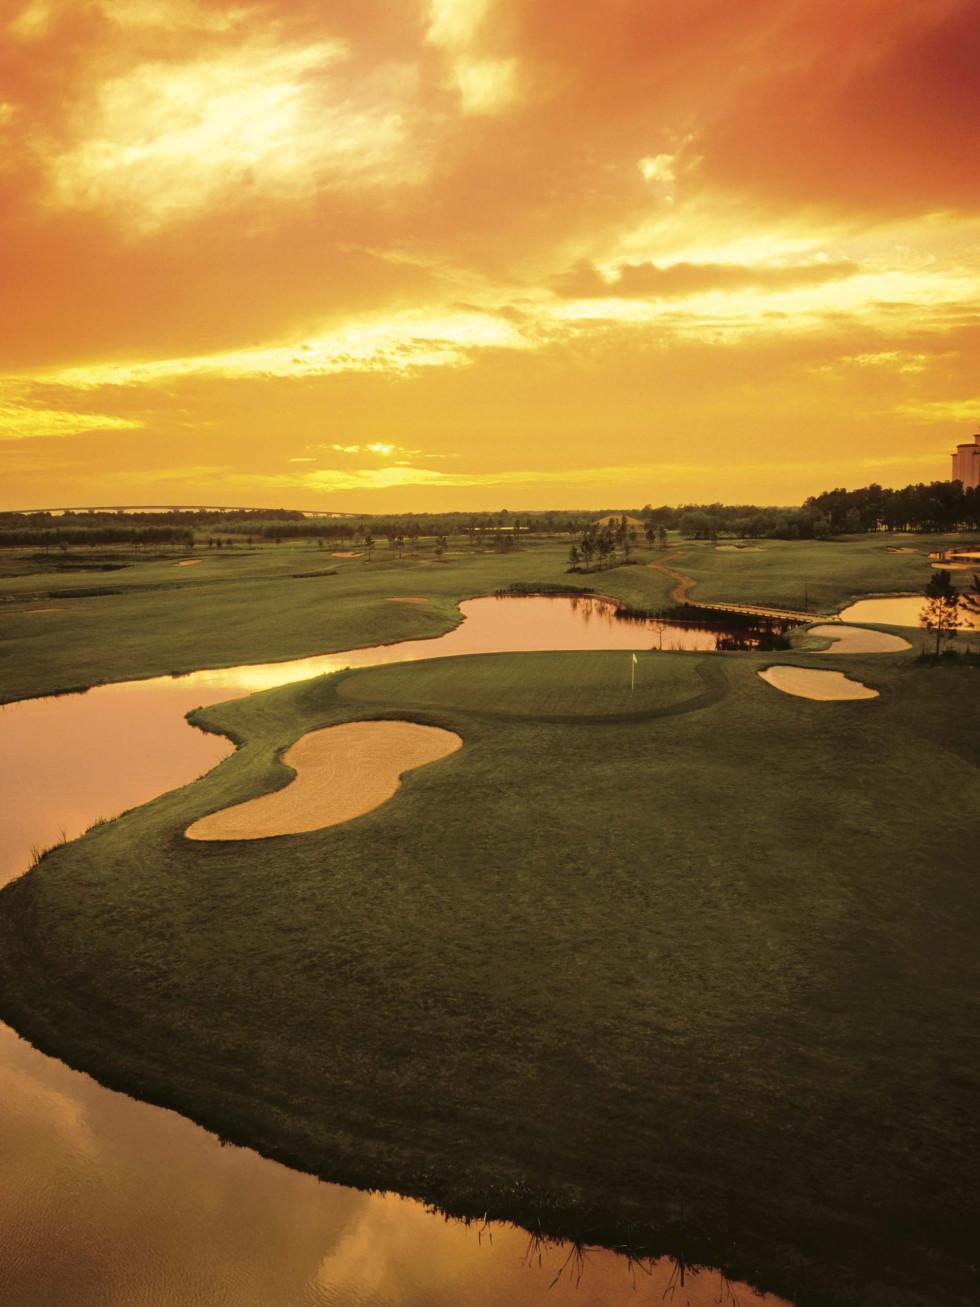 Contraband Bayou Golf Club at L'Auberge Casino Resort